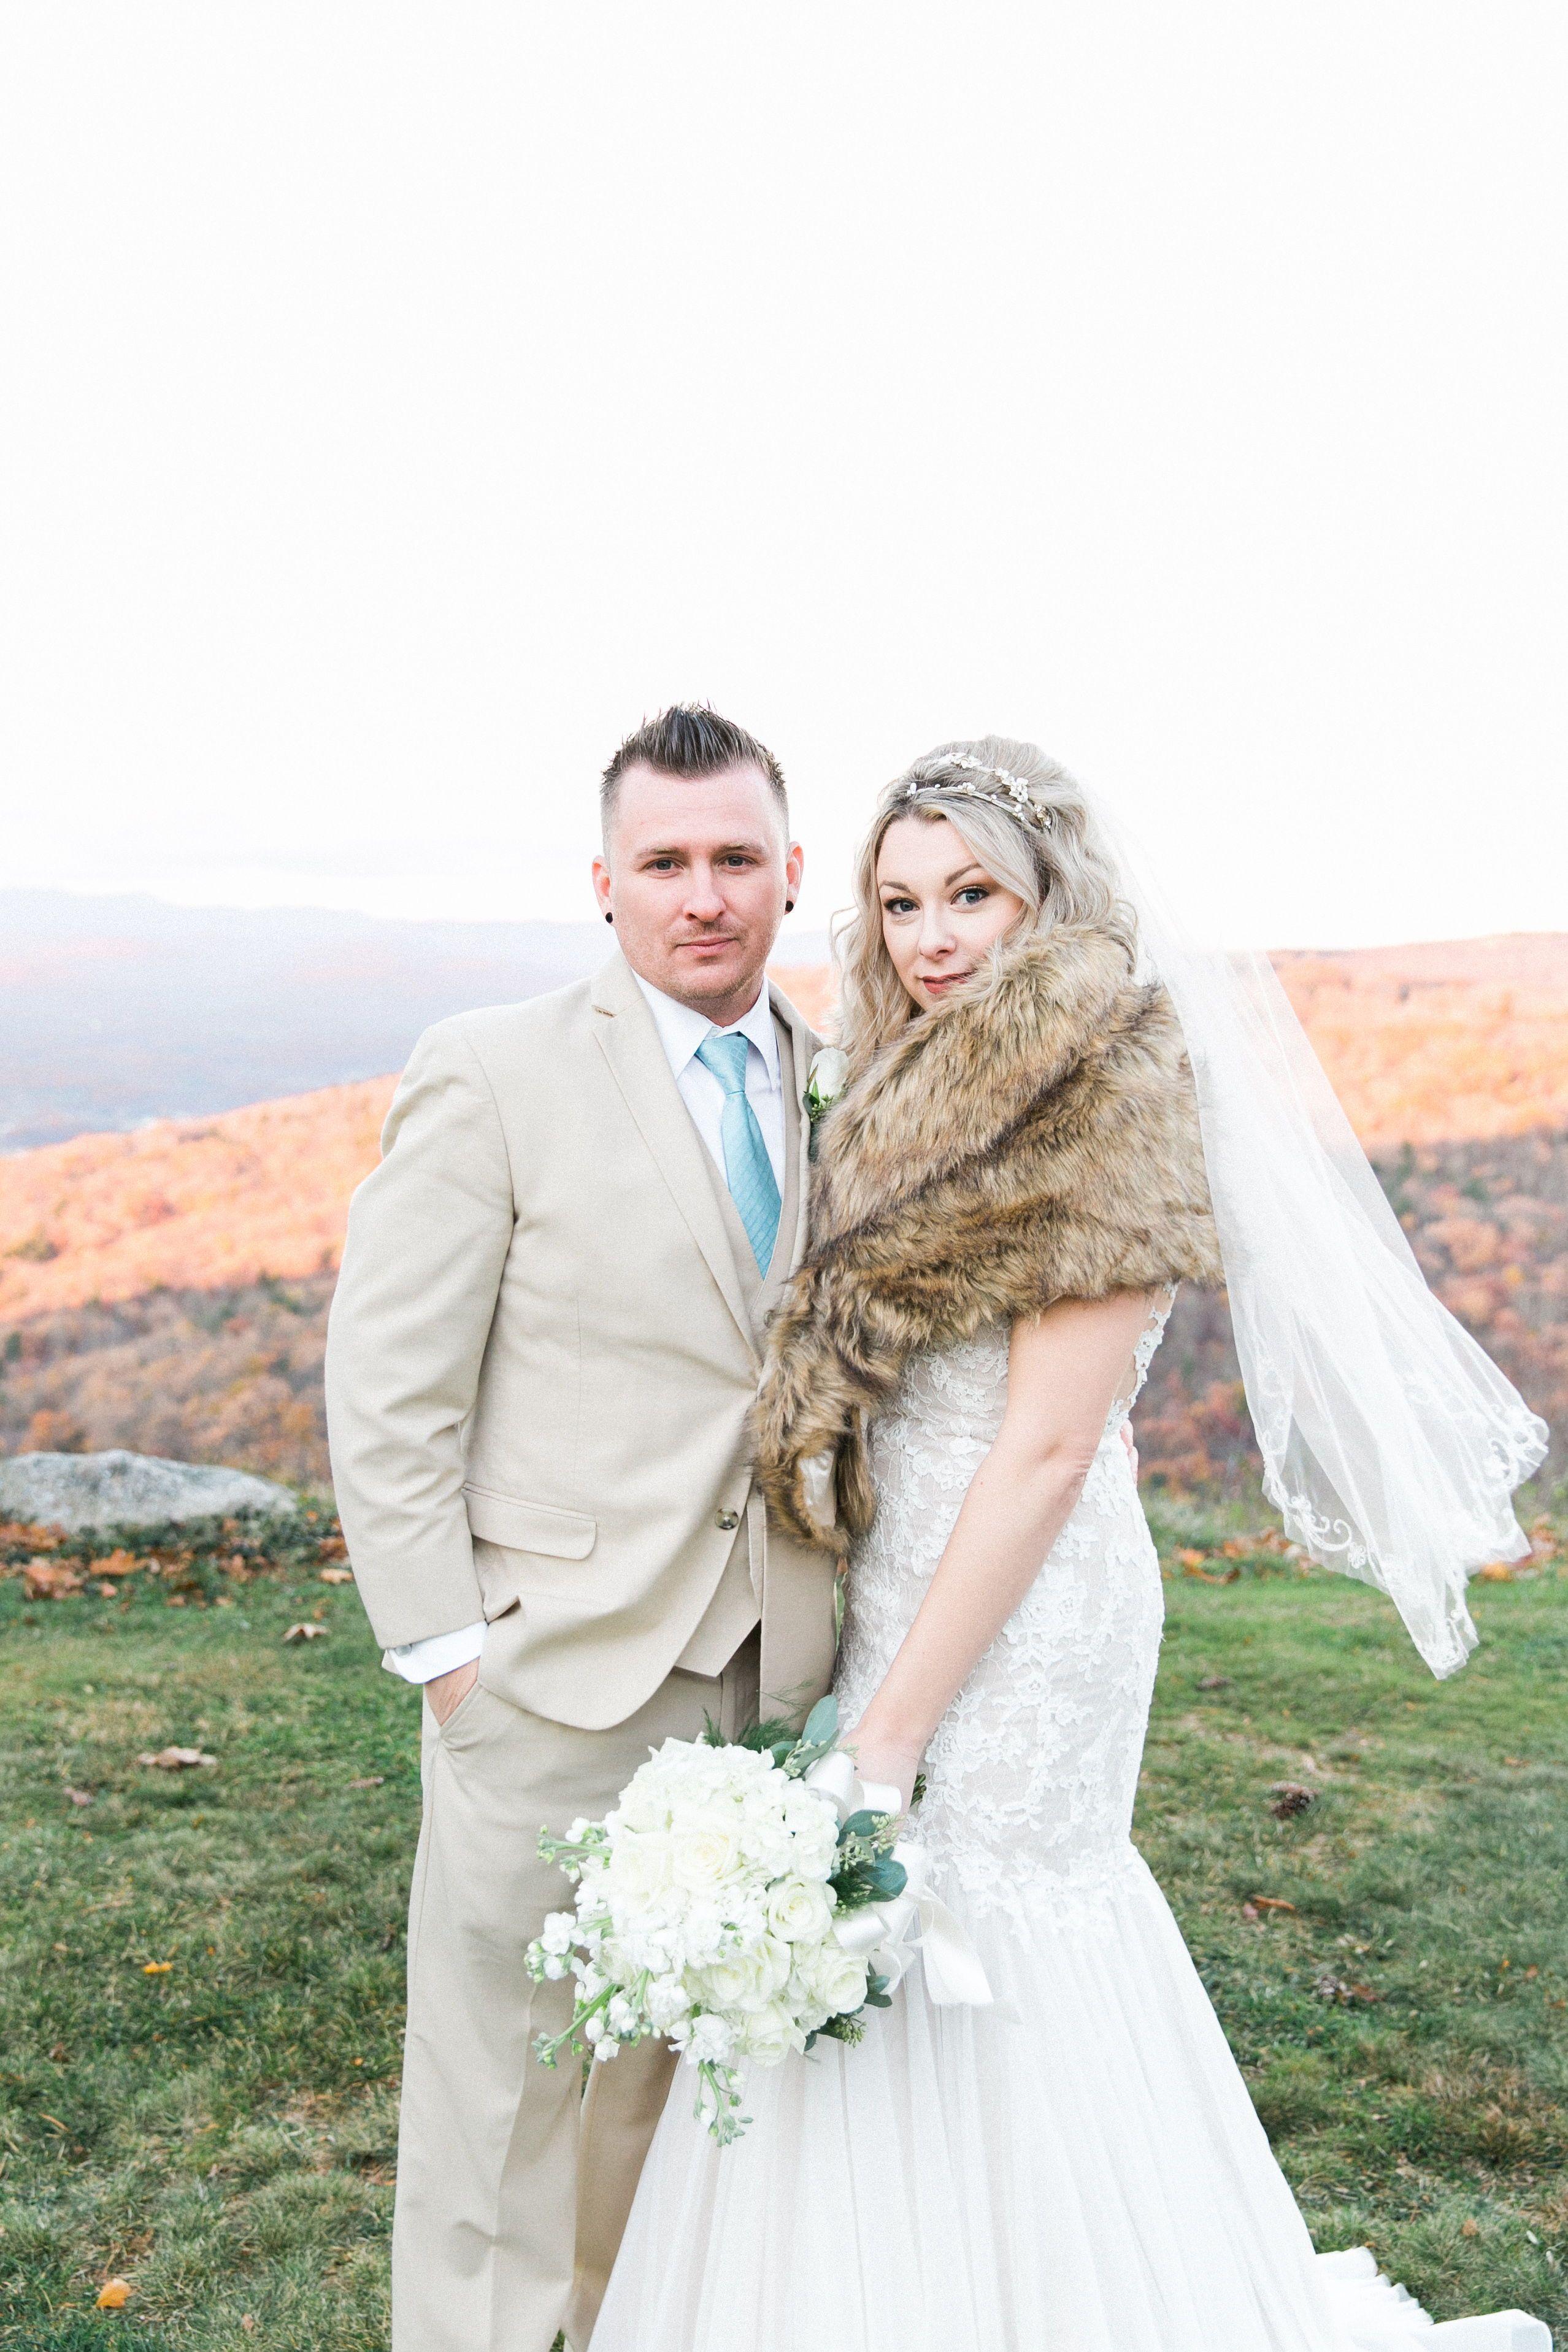 Carroll Tice Photography wedding reception, florals